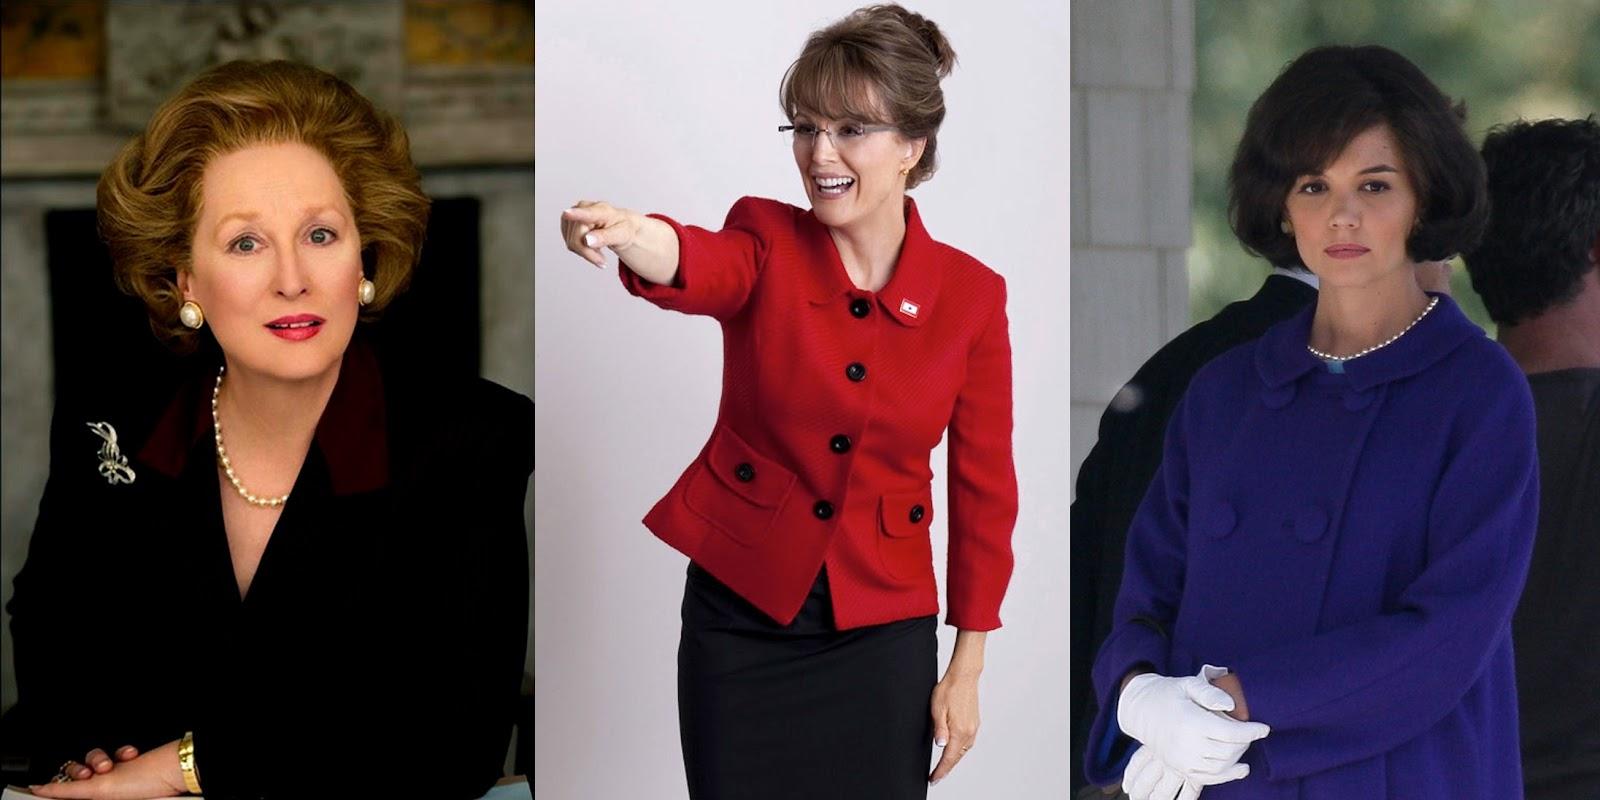 http://3.bp.blogspot.com/-BhMCZAA2sYU/TiicgCU588I/AAAAAAAAD3o/ULzZcjnHEjM/s1600/Meryl+Streep+as+Margaret+Thatcher%252C+Julianne+Moore+as+Sarah+Palin%252C+Katie+Holmes+as+Jackie+Kennedy.jpg